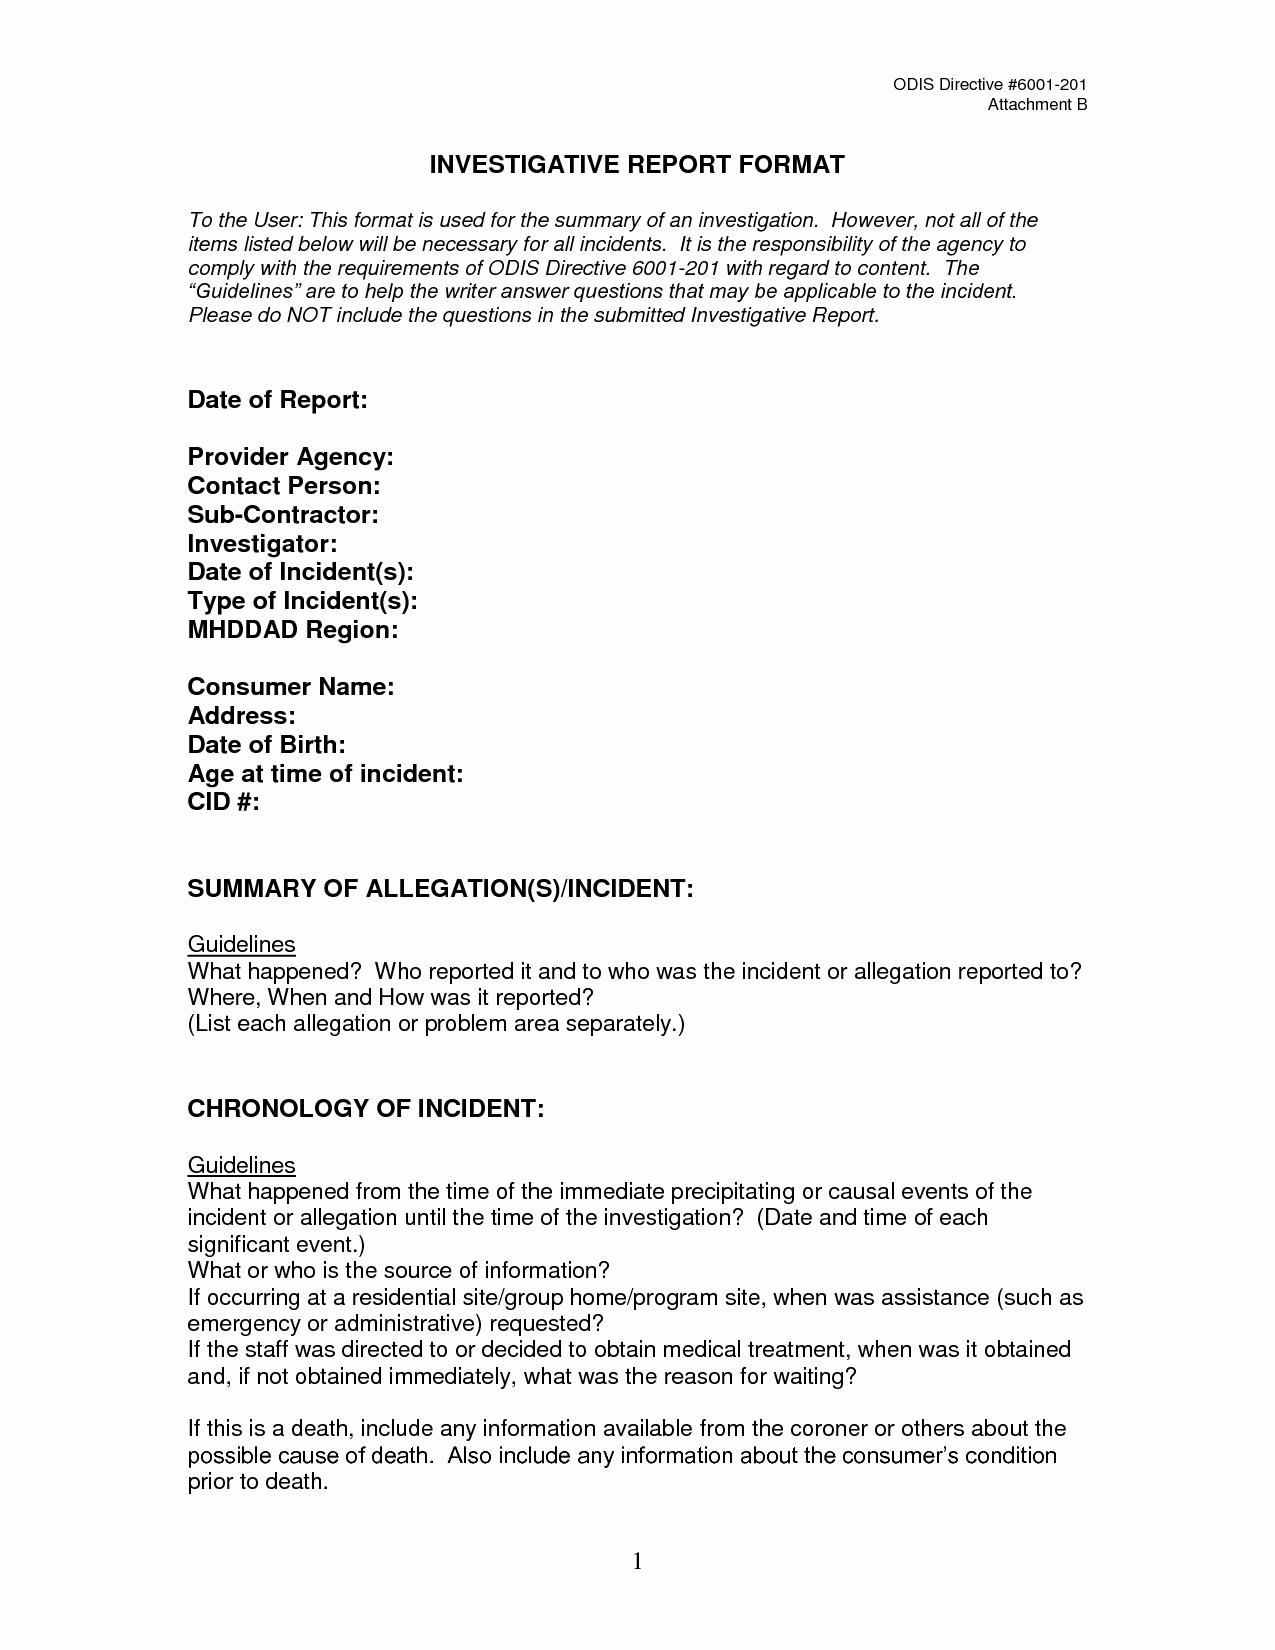 Internal Investigation Report Template Elegant Best S Of Investigation Report Template Sample